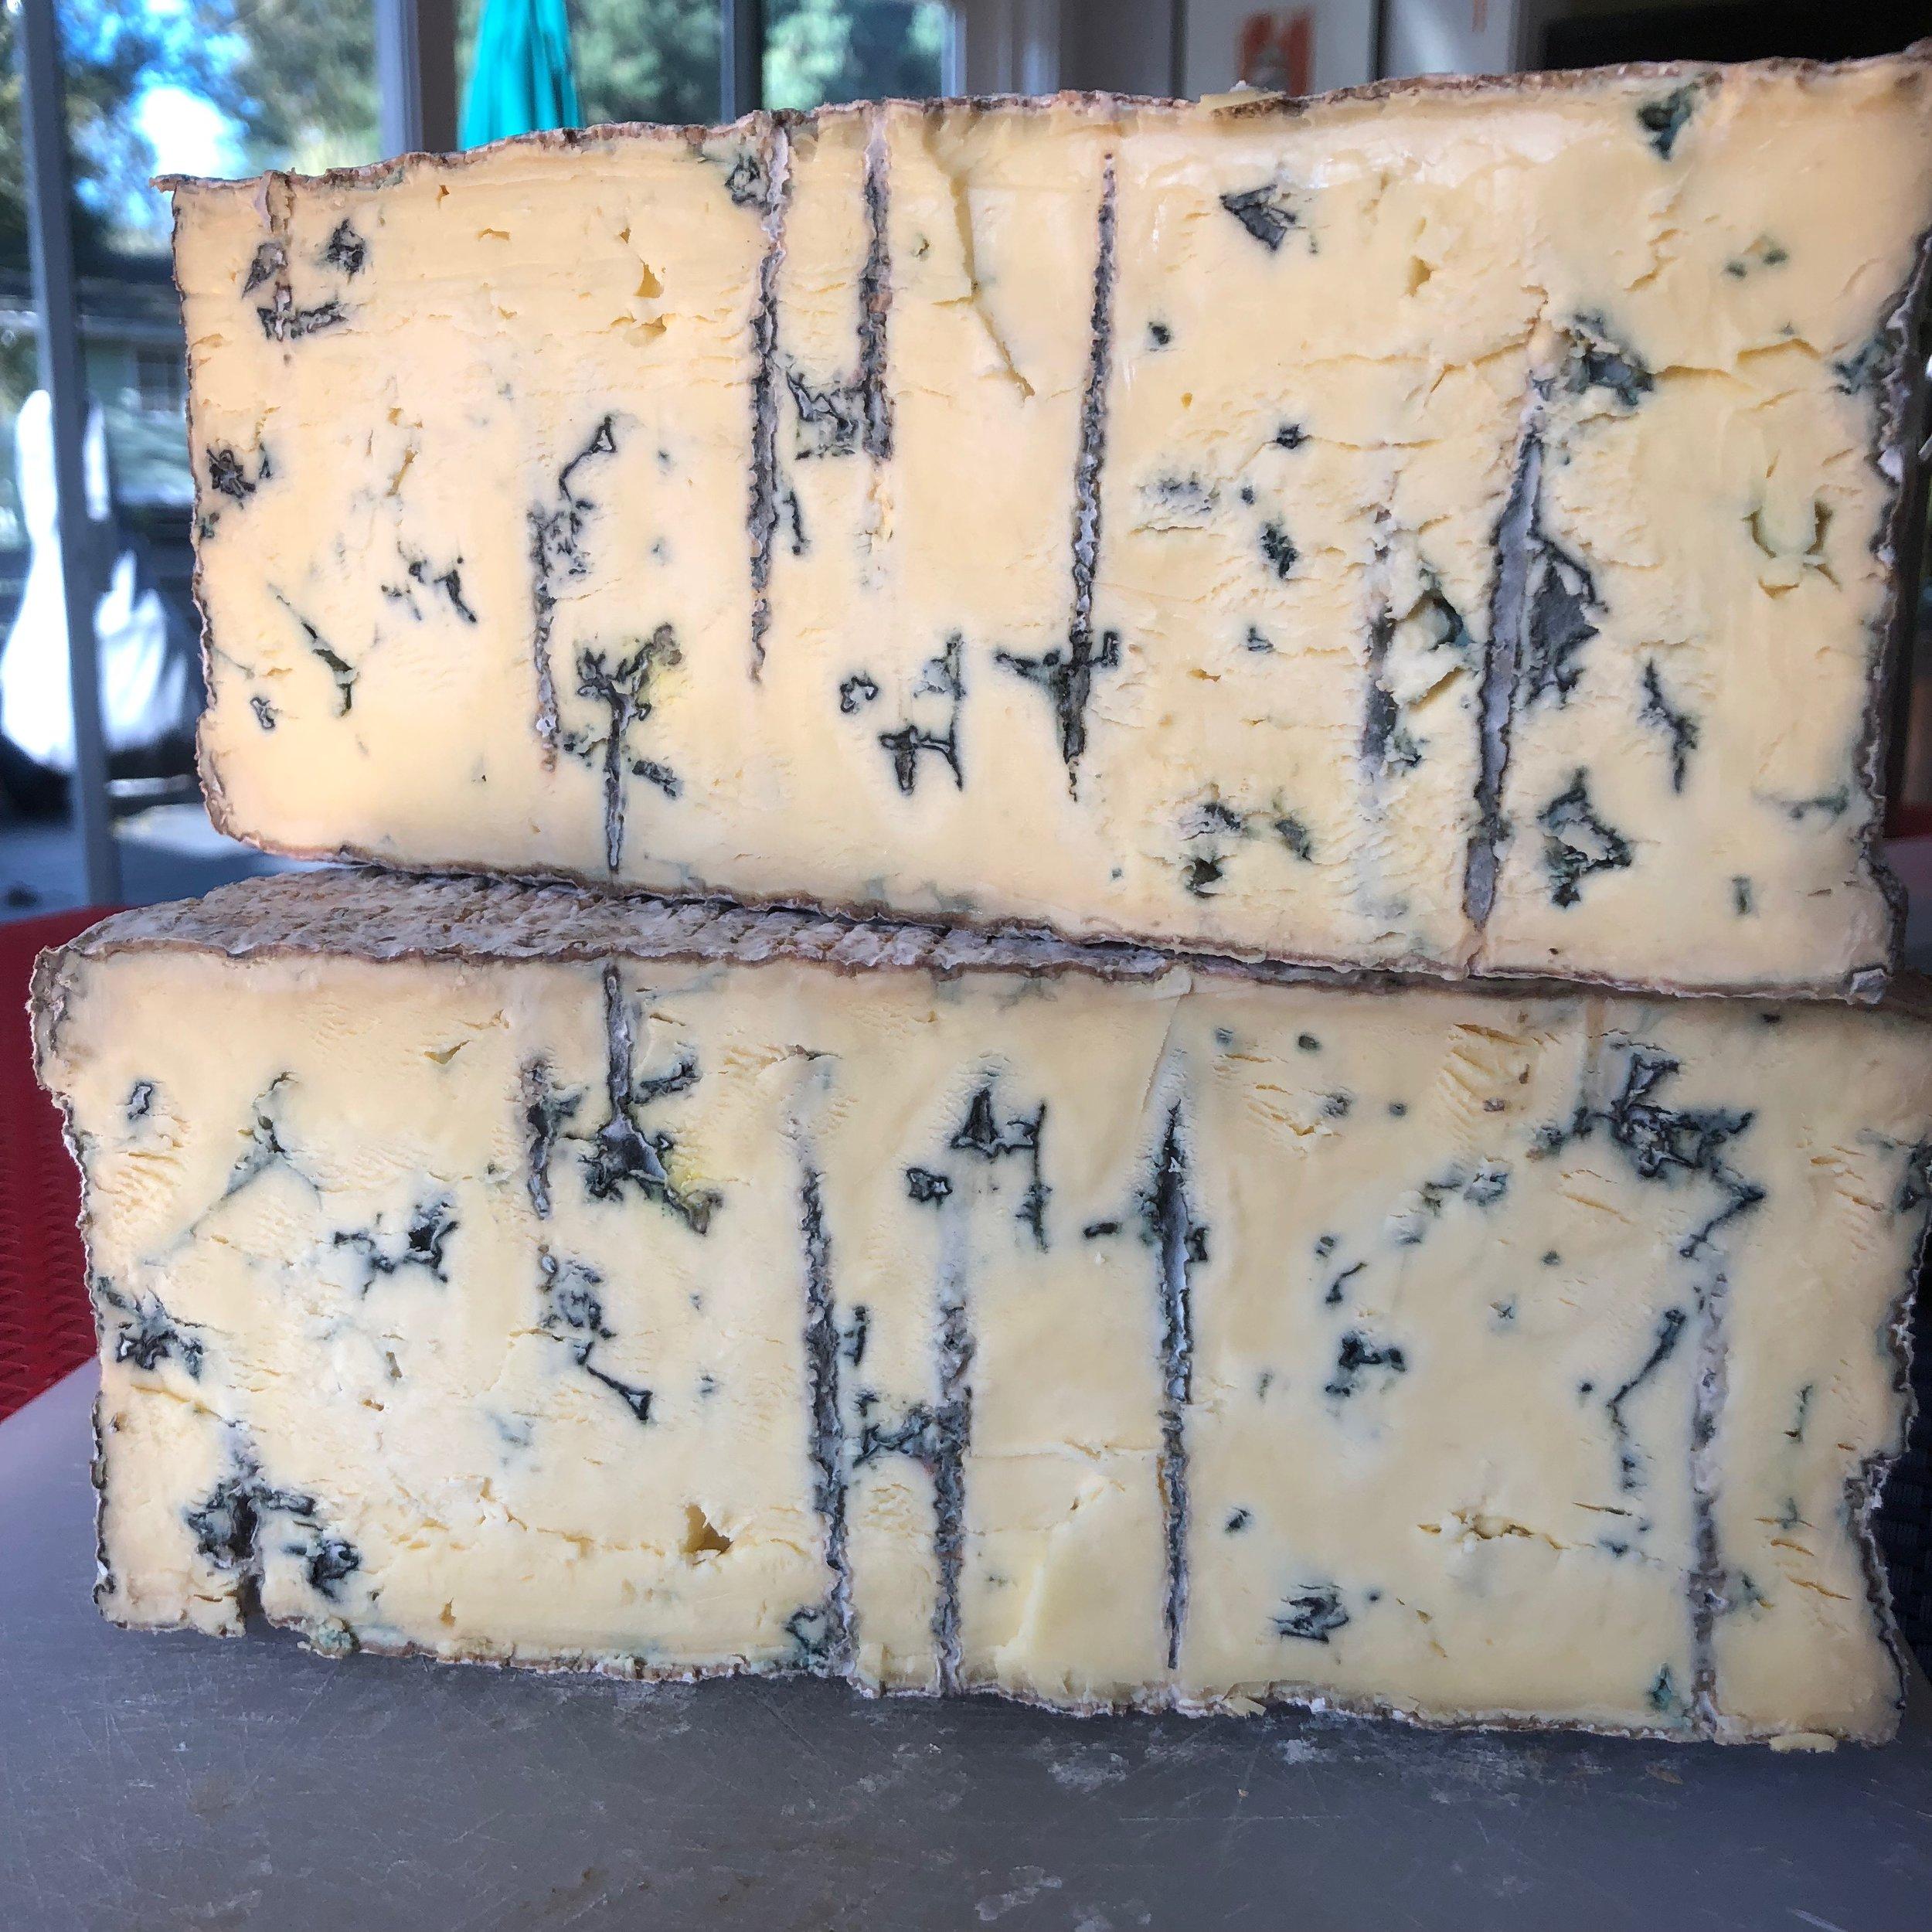 Bootleg Blue raw Jersey-milk cheese